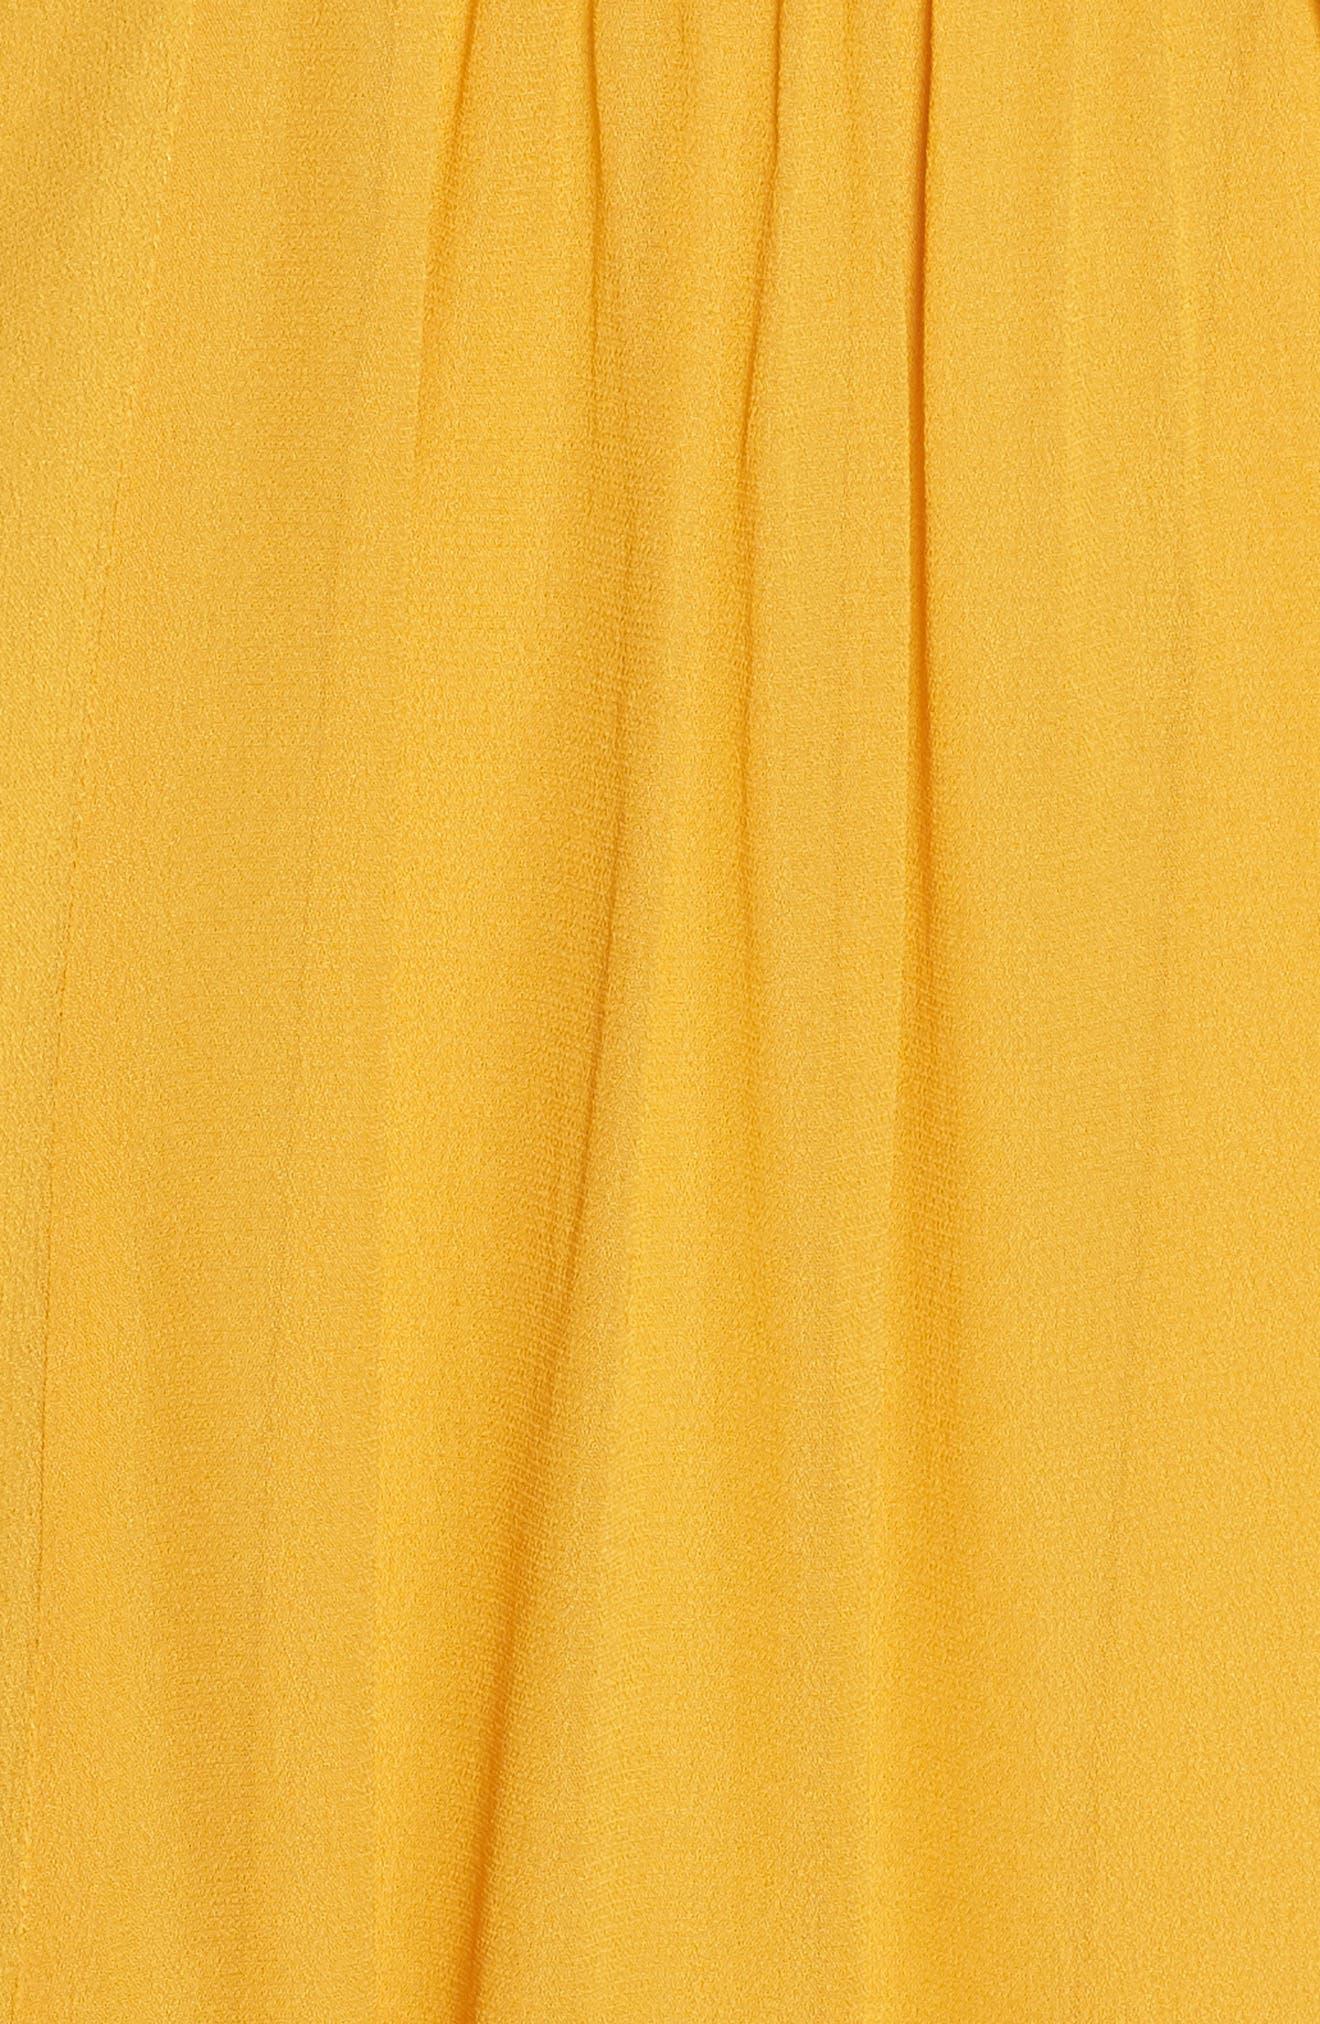 Embroidered Yoke Trapeze Dress,                             Alternate thumbnail 6, color,                             Ochre